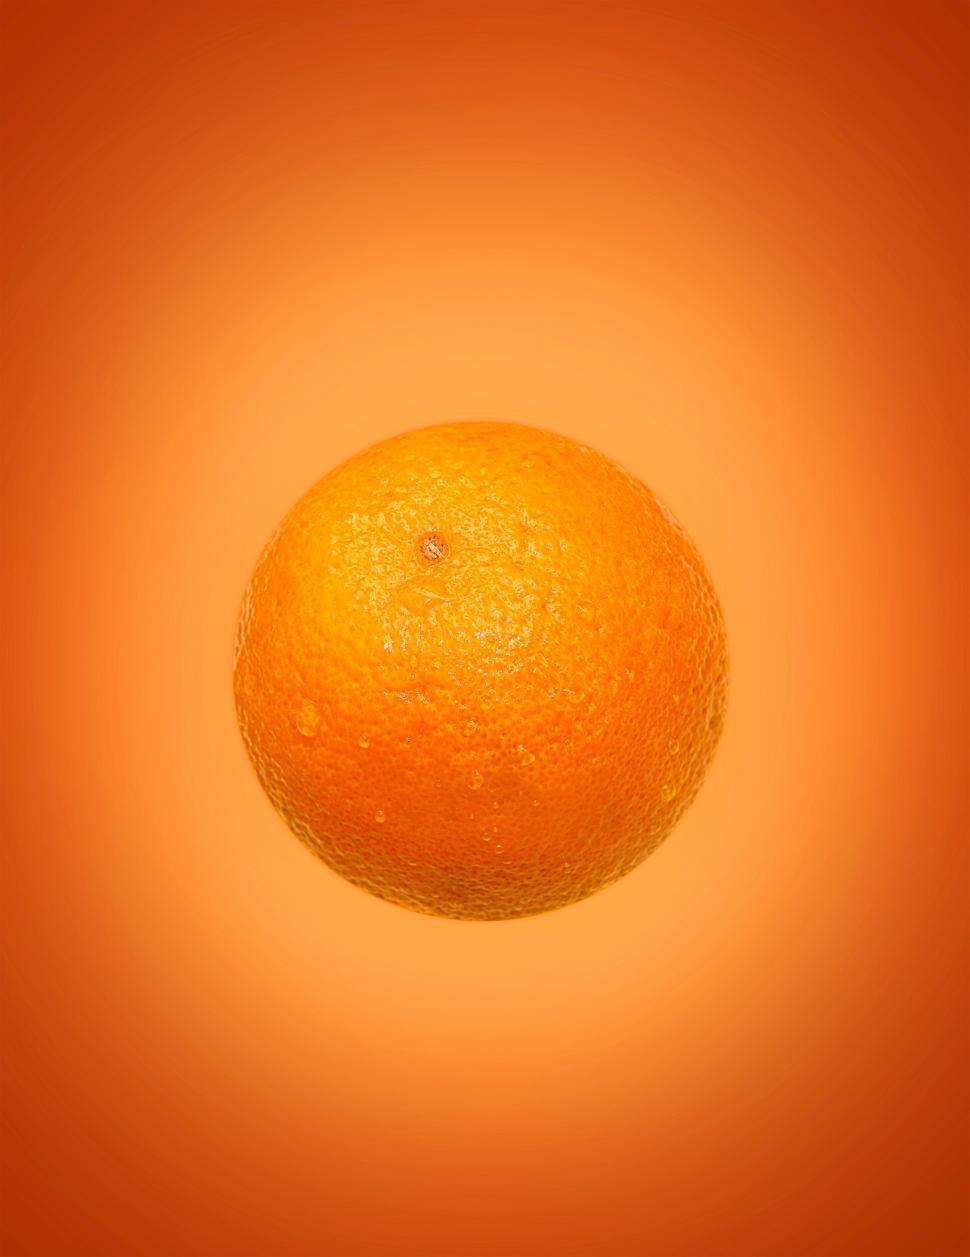 Download Free Stock Photo of Orange on Orange